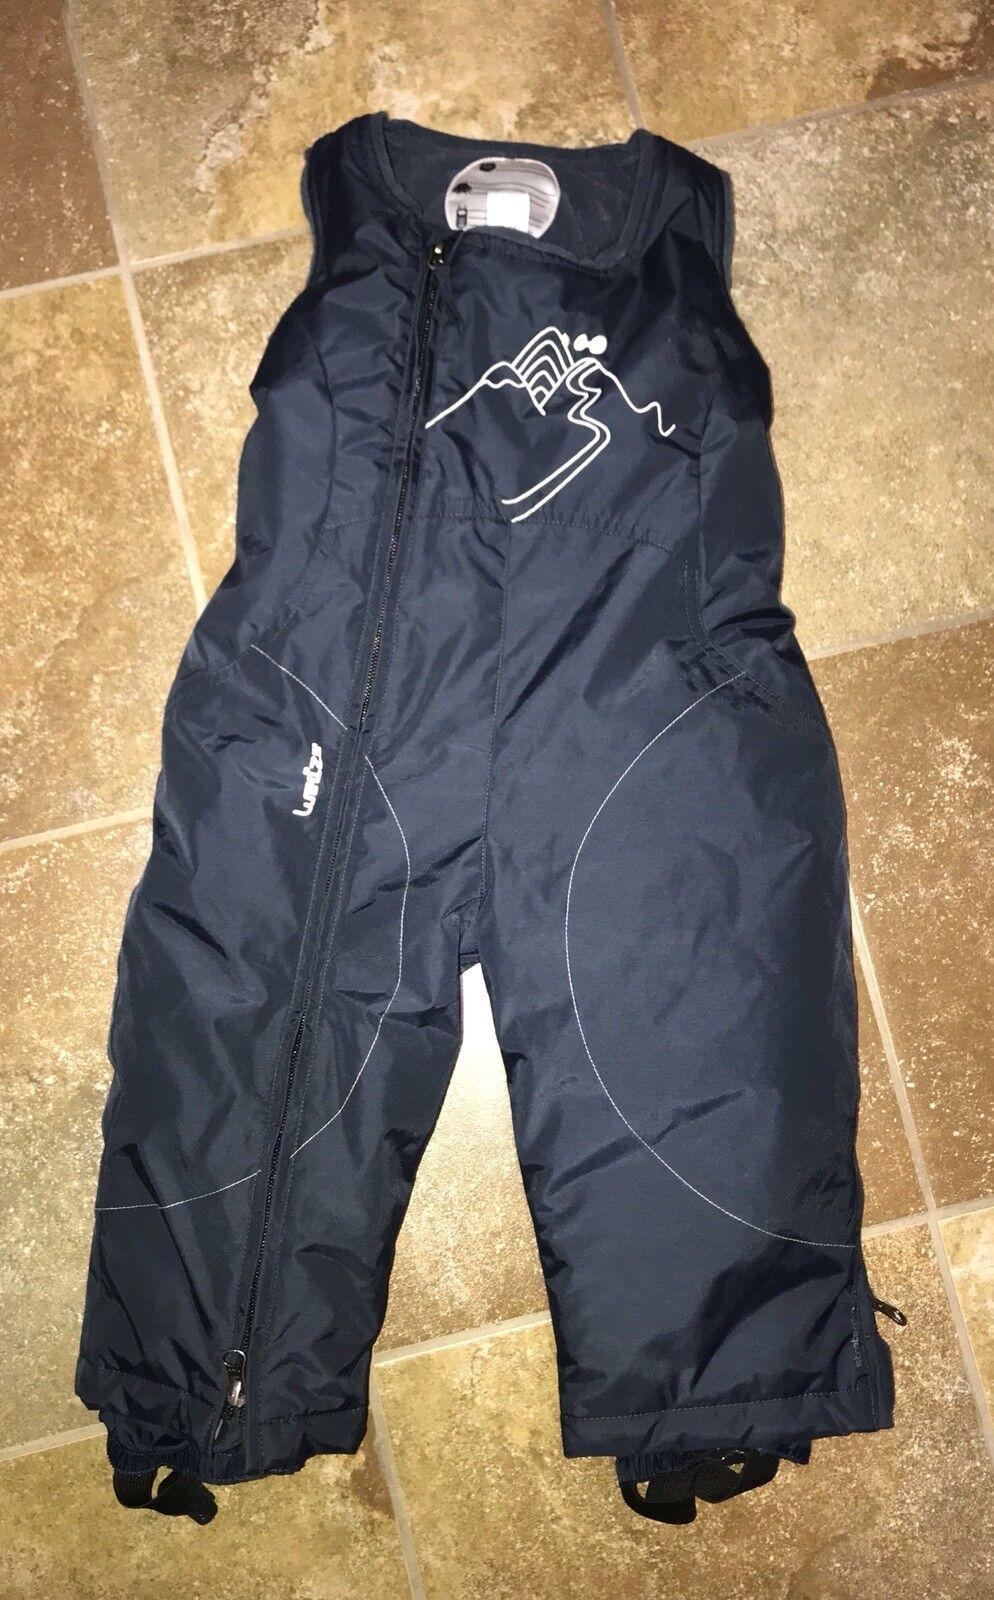 WED'ZE OXYLANE Navy bluee SNOW BIBS Ski One Piece Jumpsuit Board Pants Size 2